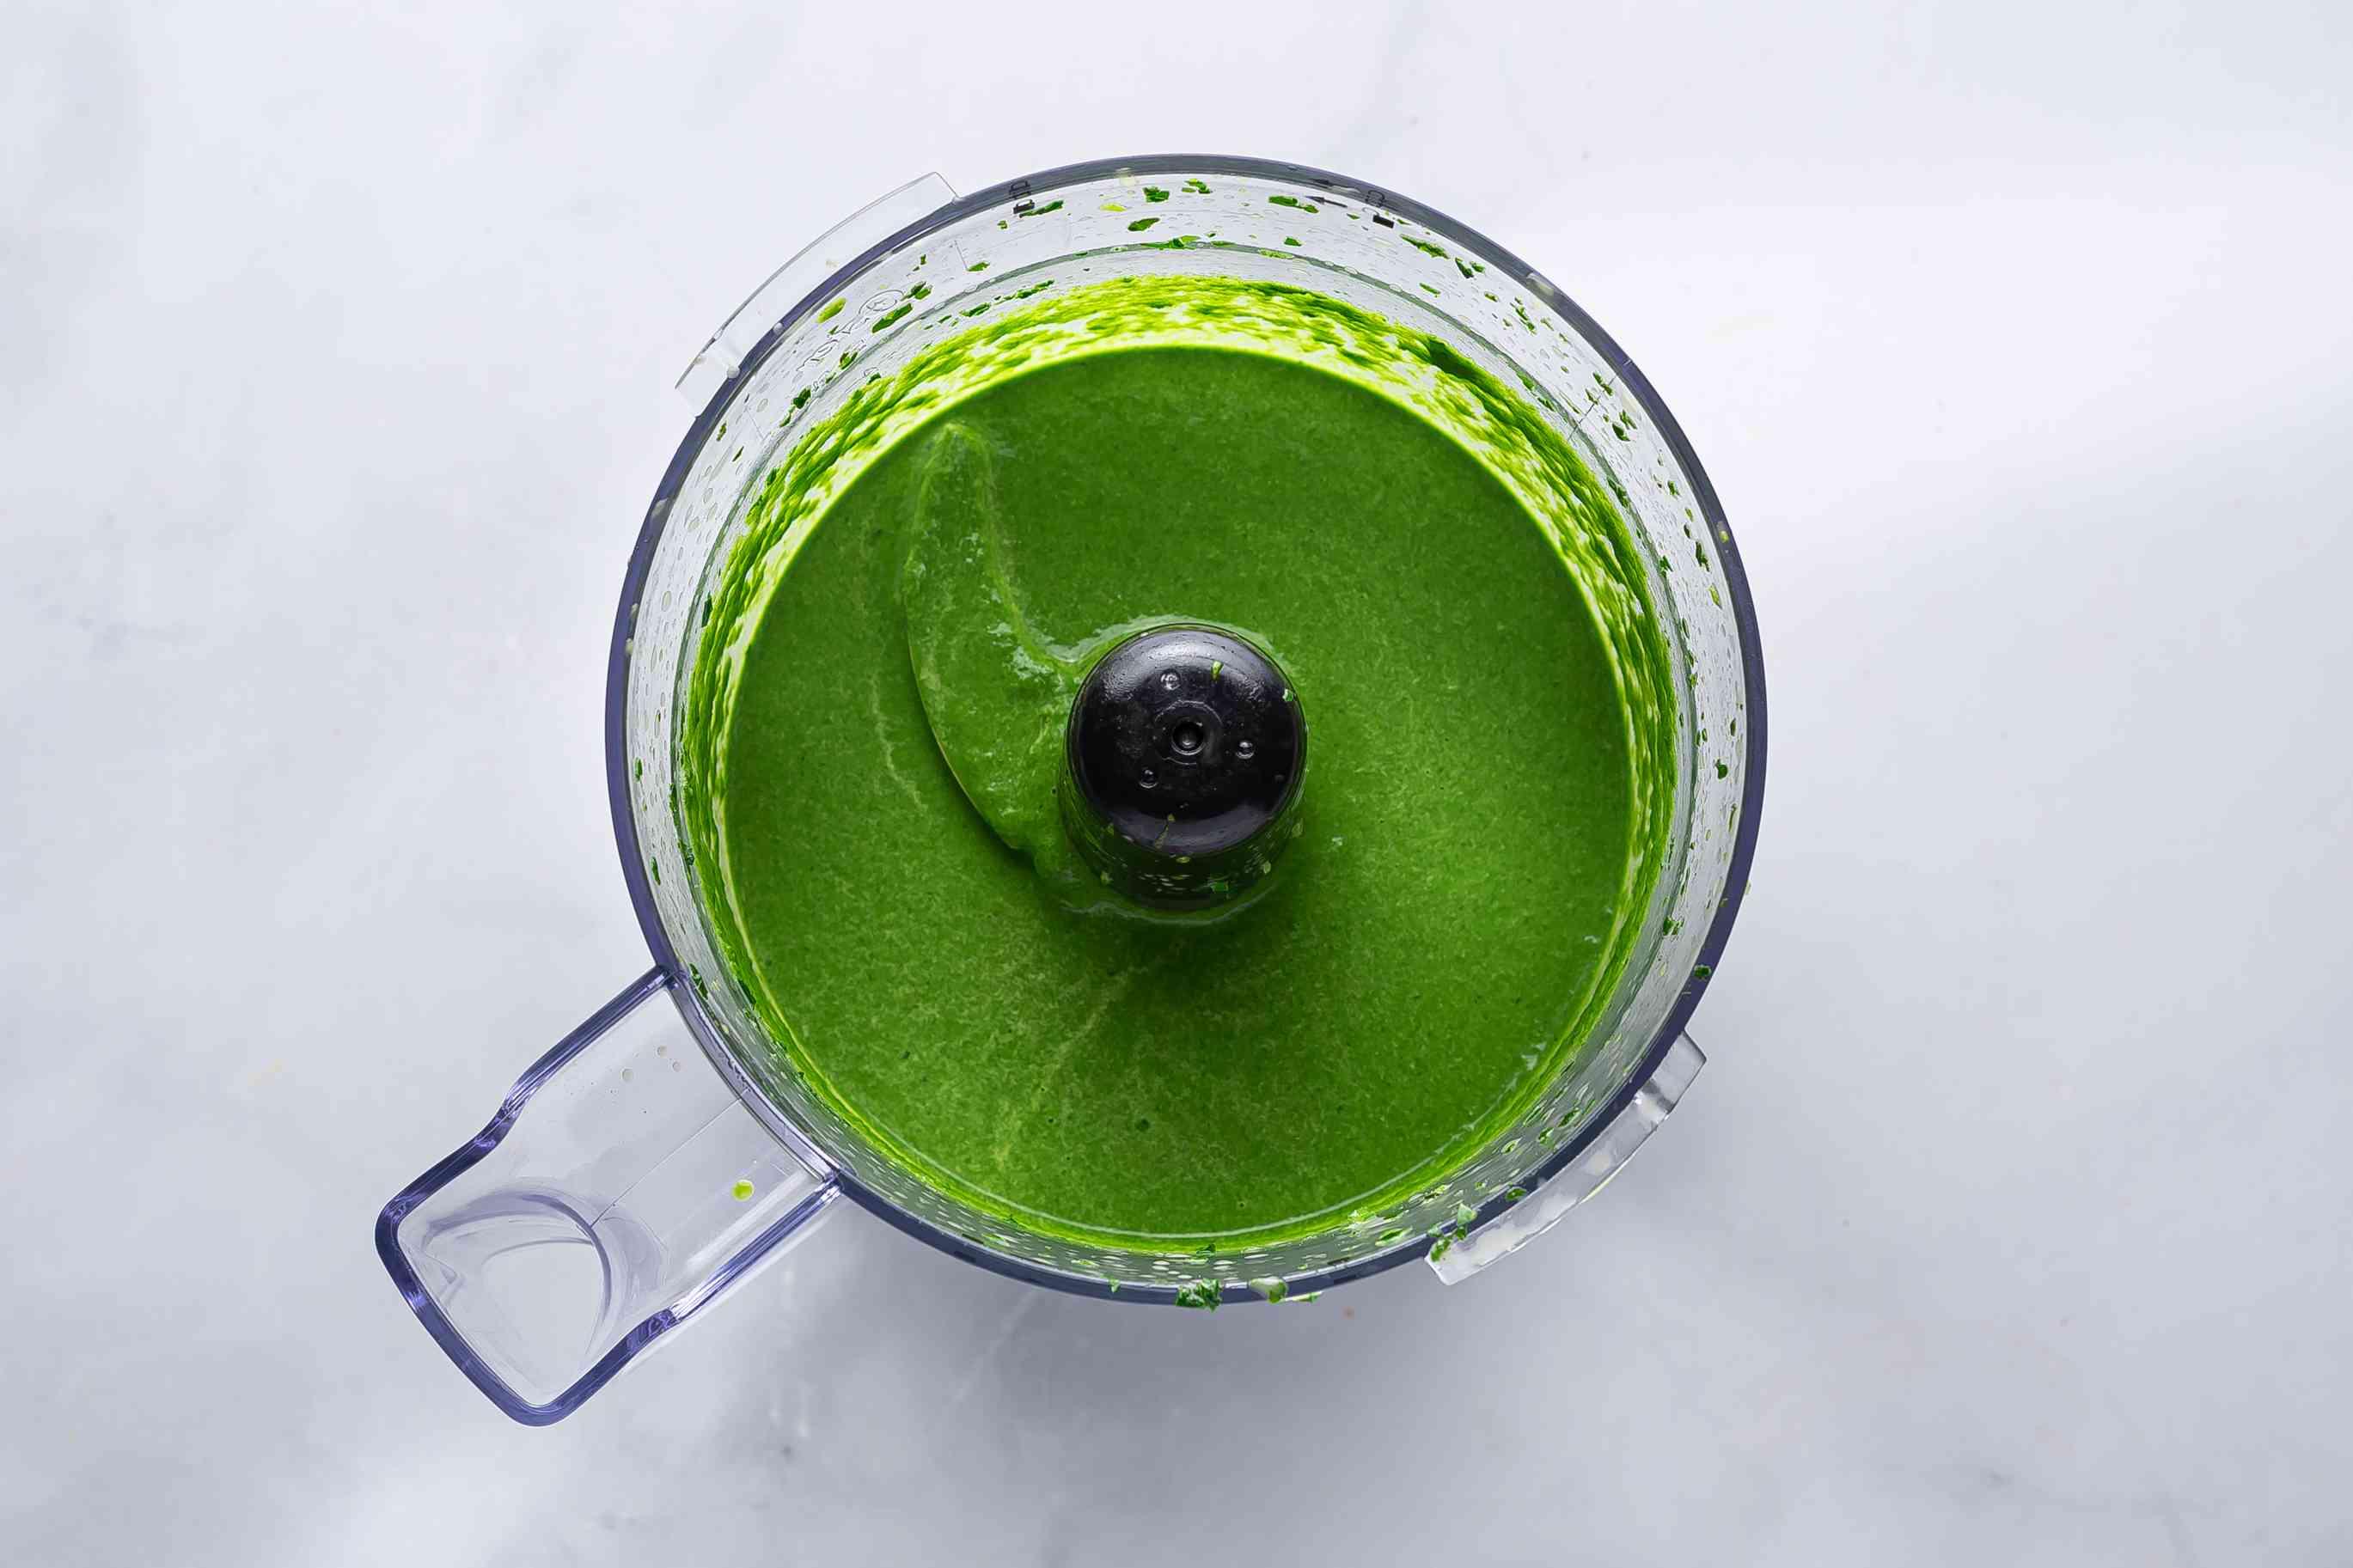 coriander, fenugreek, and mint mixture in a food processor